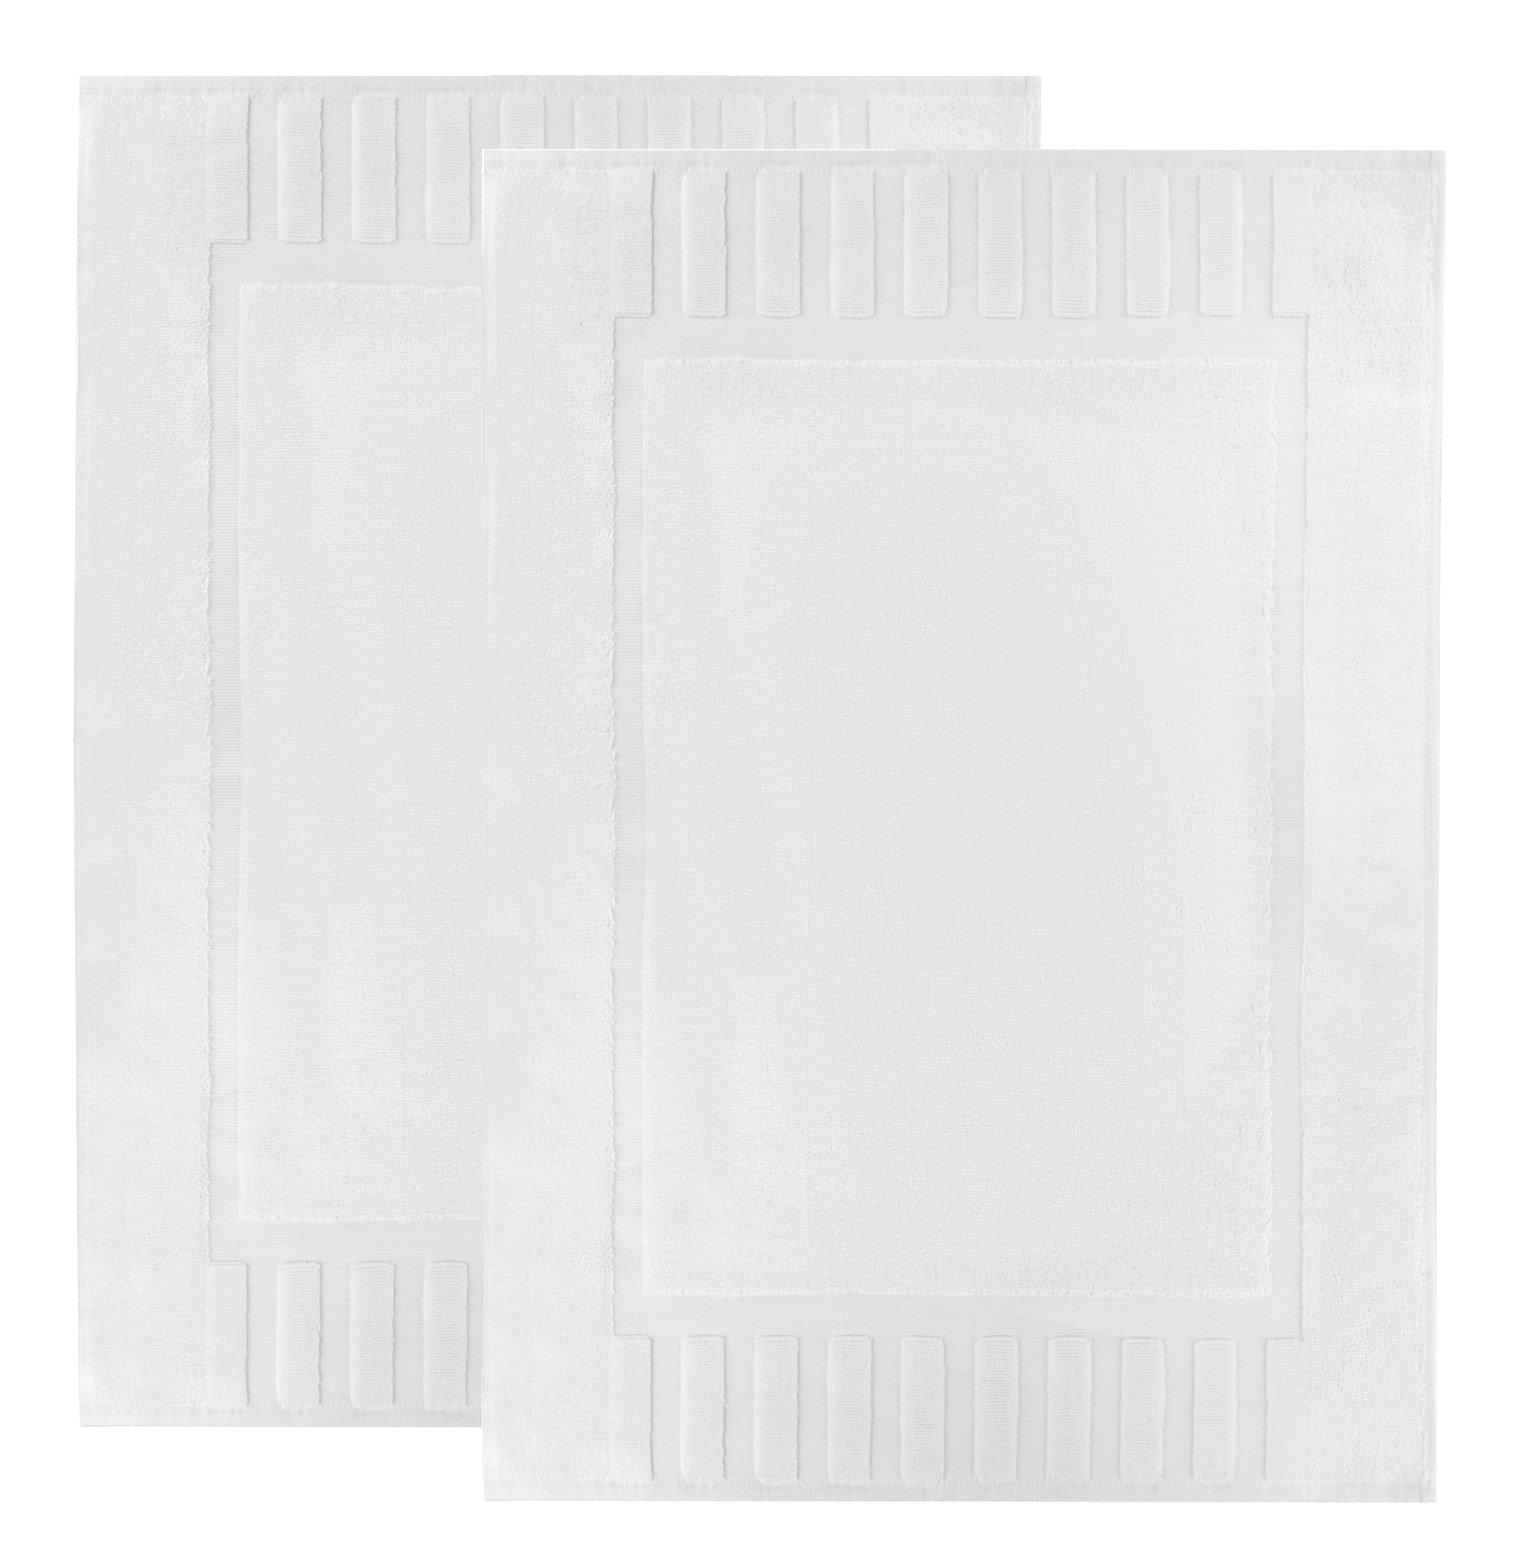 Luxury White Cotton Bath-Mats Hotel-Spa-Washable-tub-Set - 100% Cotton Reversible Hotel Quality Bath Mat Set - 2 Pack - 22''x34''